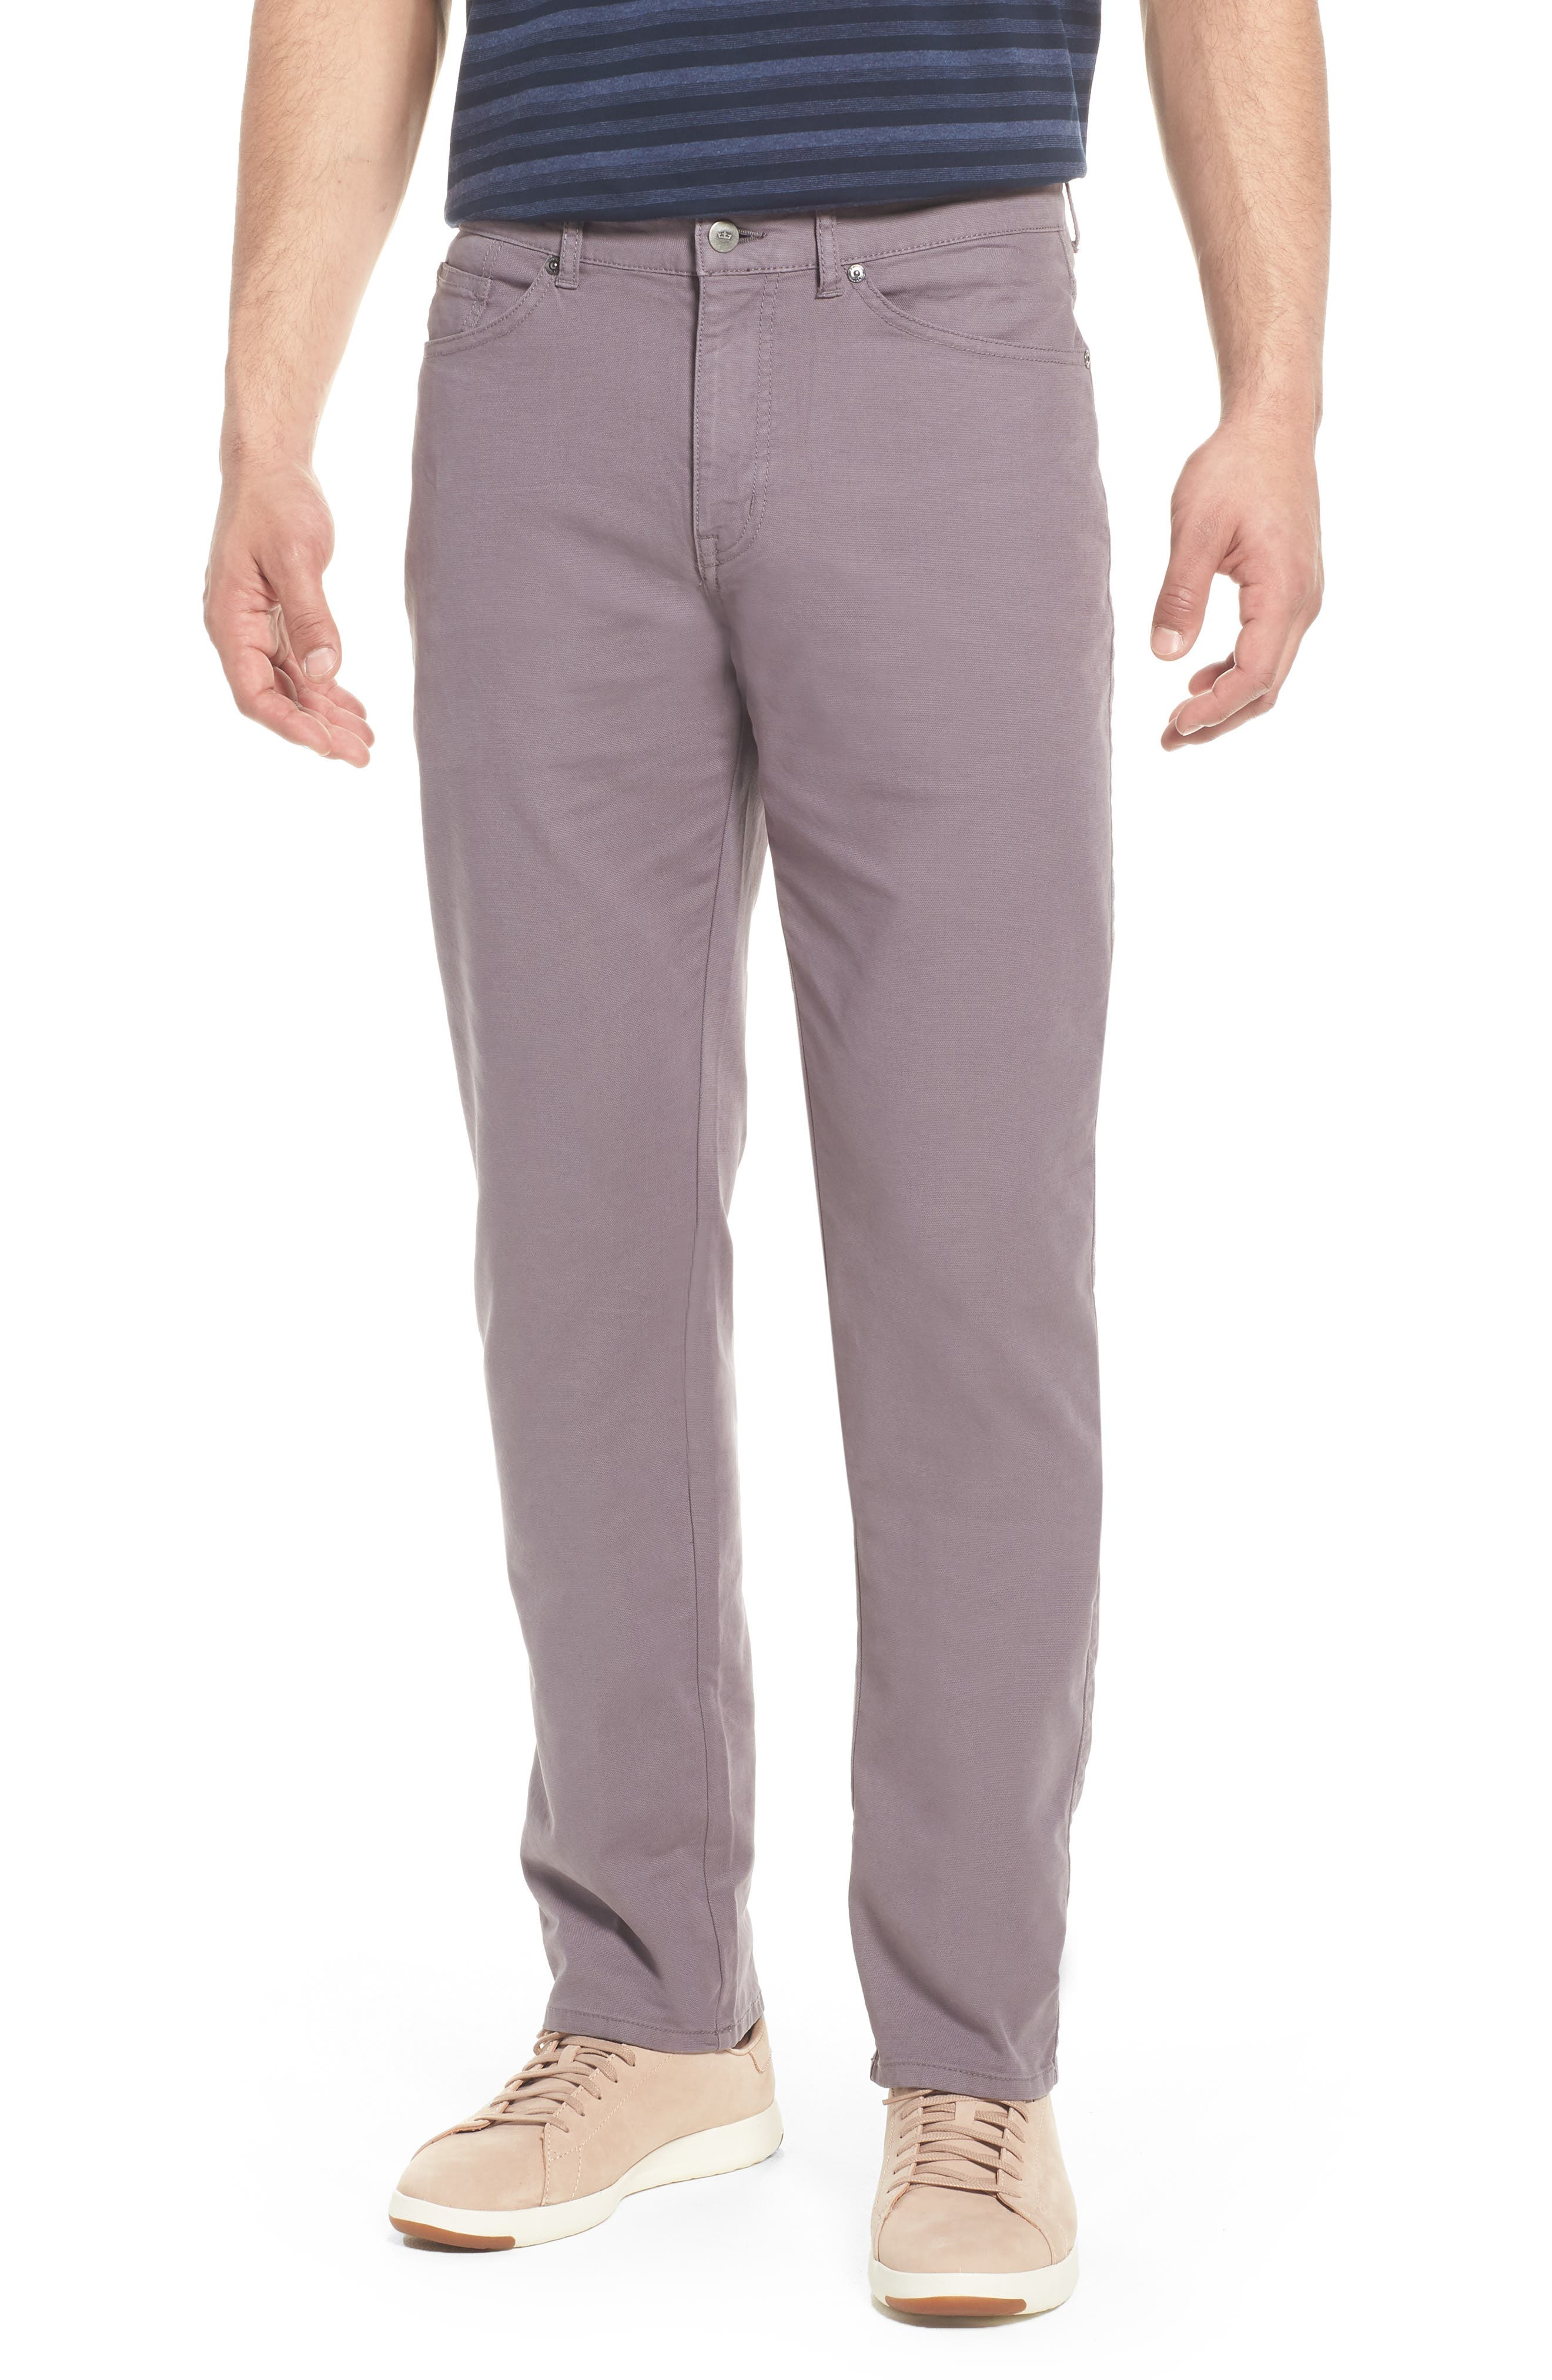 Crown Vintage Canvas Pants,                         Main,                         color, MID GREY